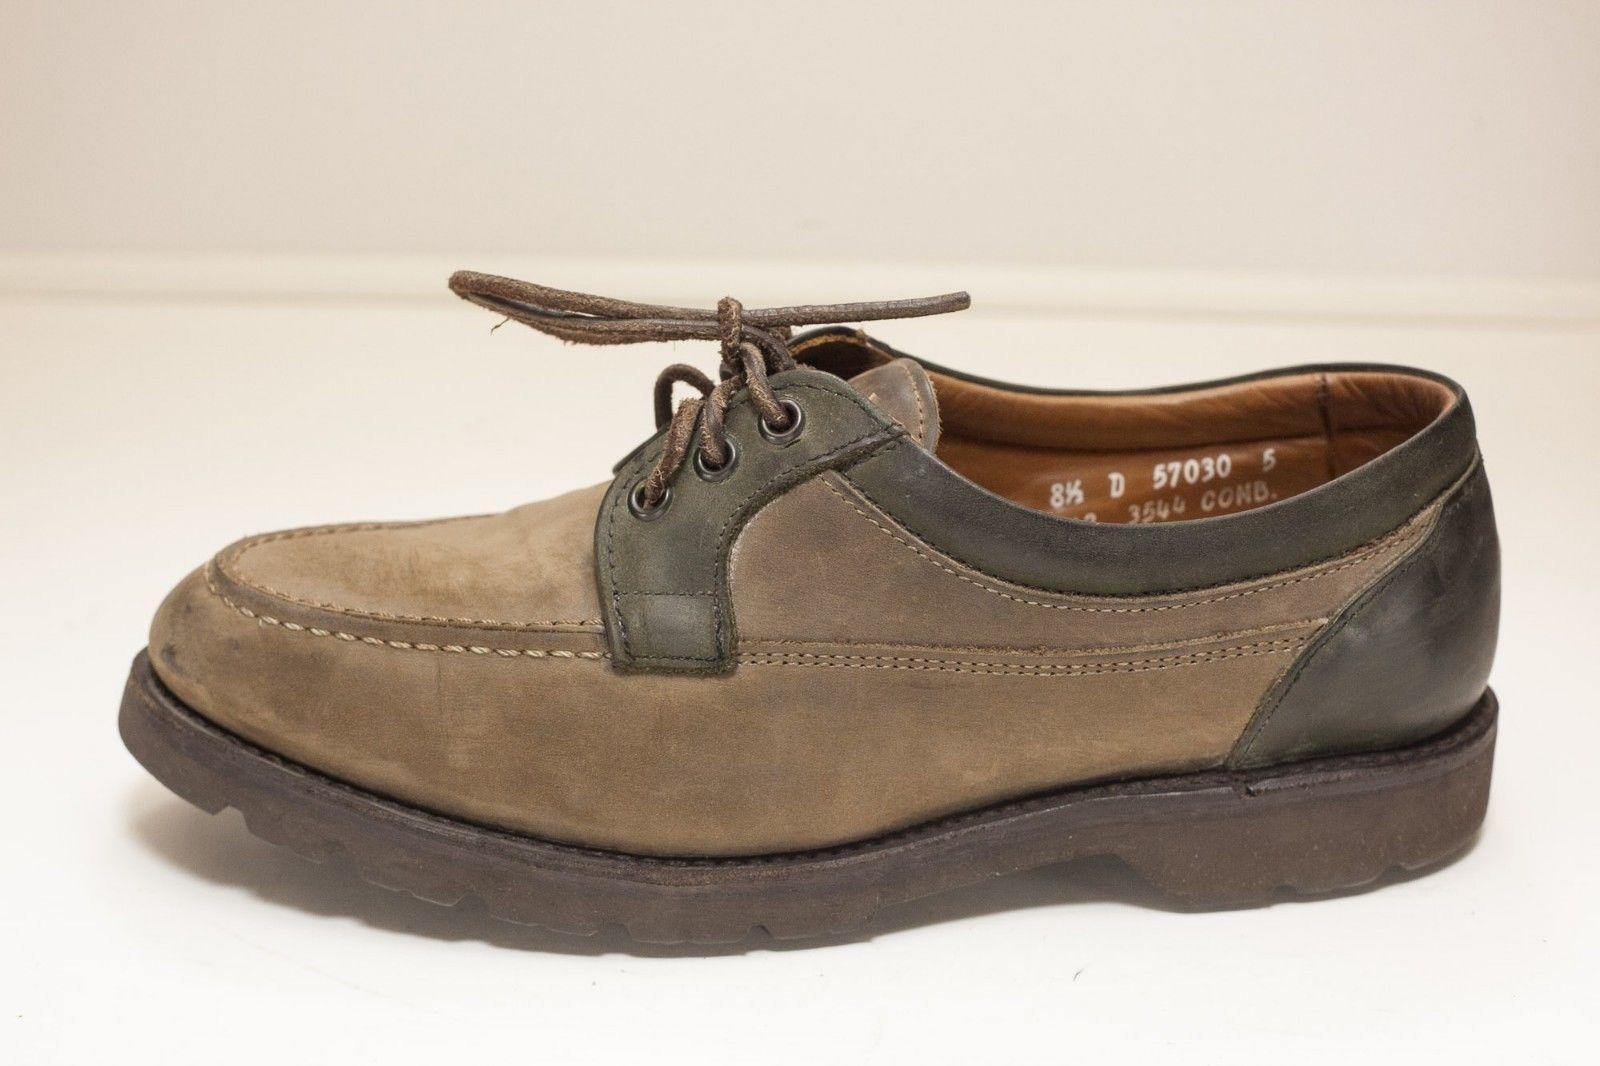 baec2ef28af Allen Edmonds 8.5 D Brown Casual Shoes - and 50 similar items